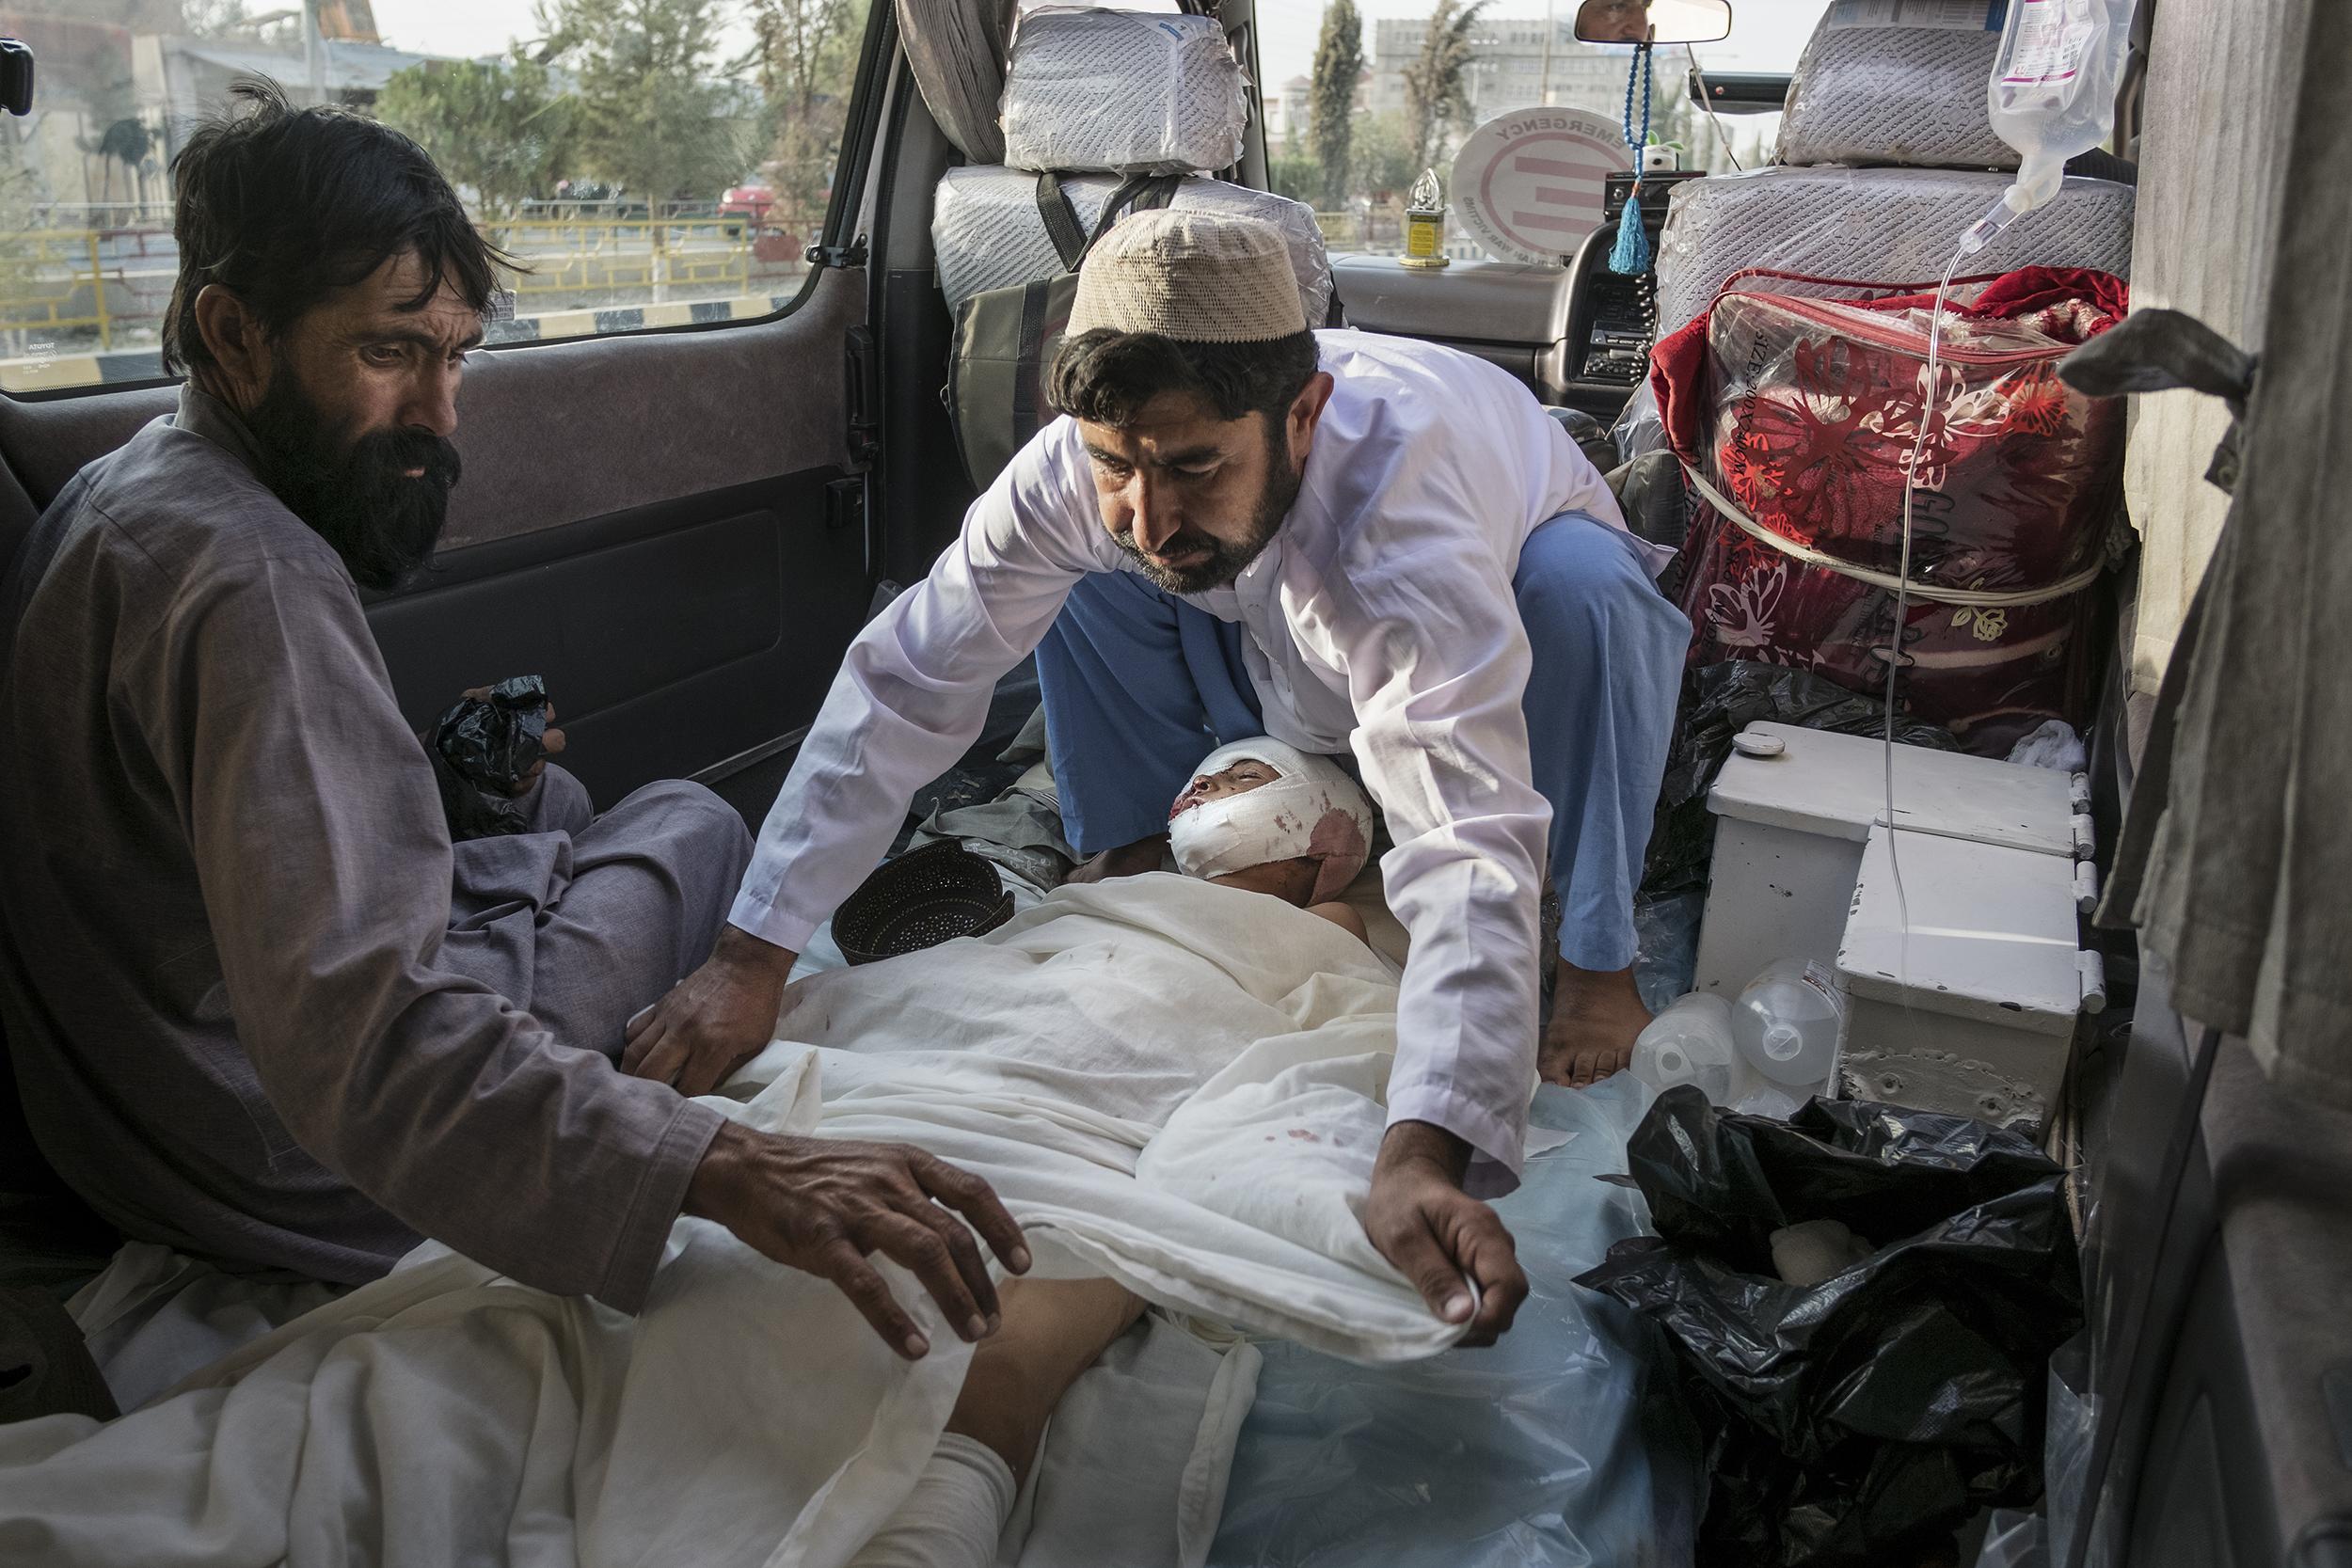 Khudai Noor viene trasportato in ambulanza al Centro per vittime di guerra di EMERGENCY a Lashkar-gah